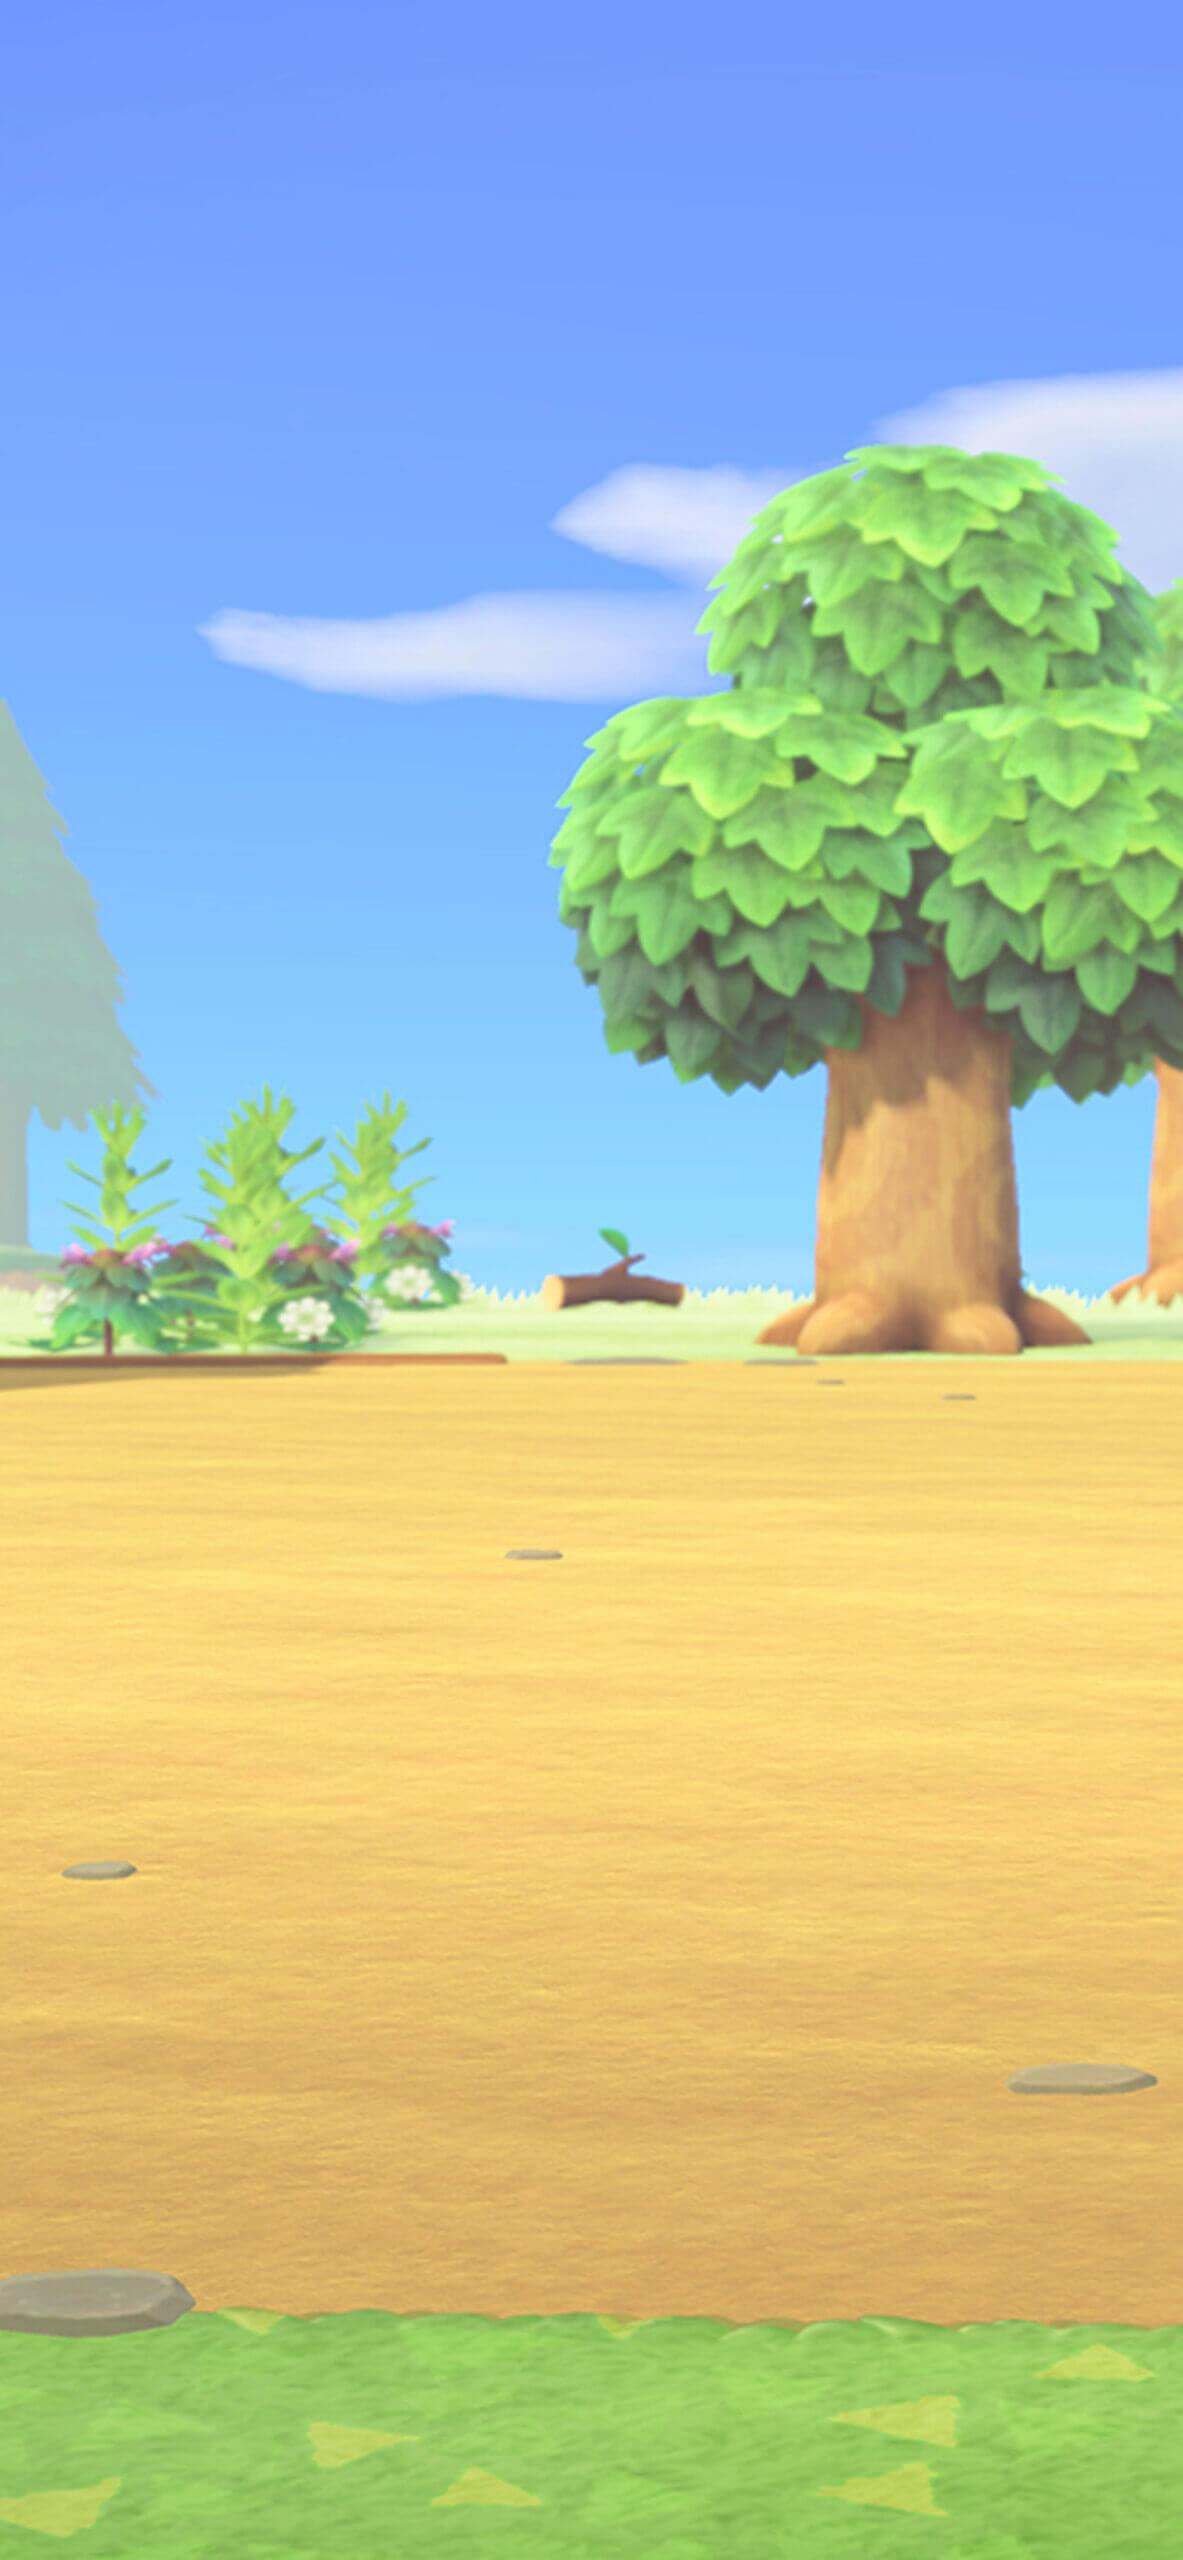 Animal Crossing Nintendo iPhone wallpaper scaled